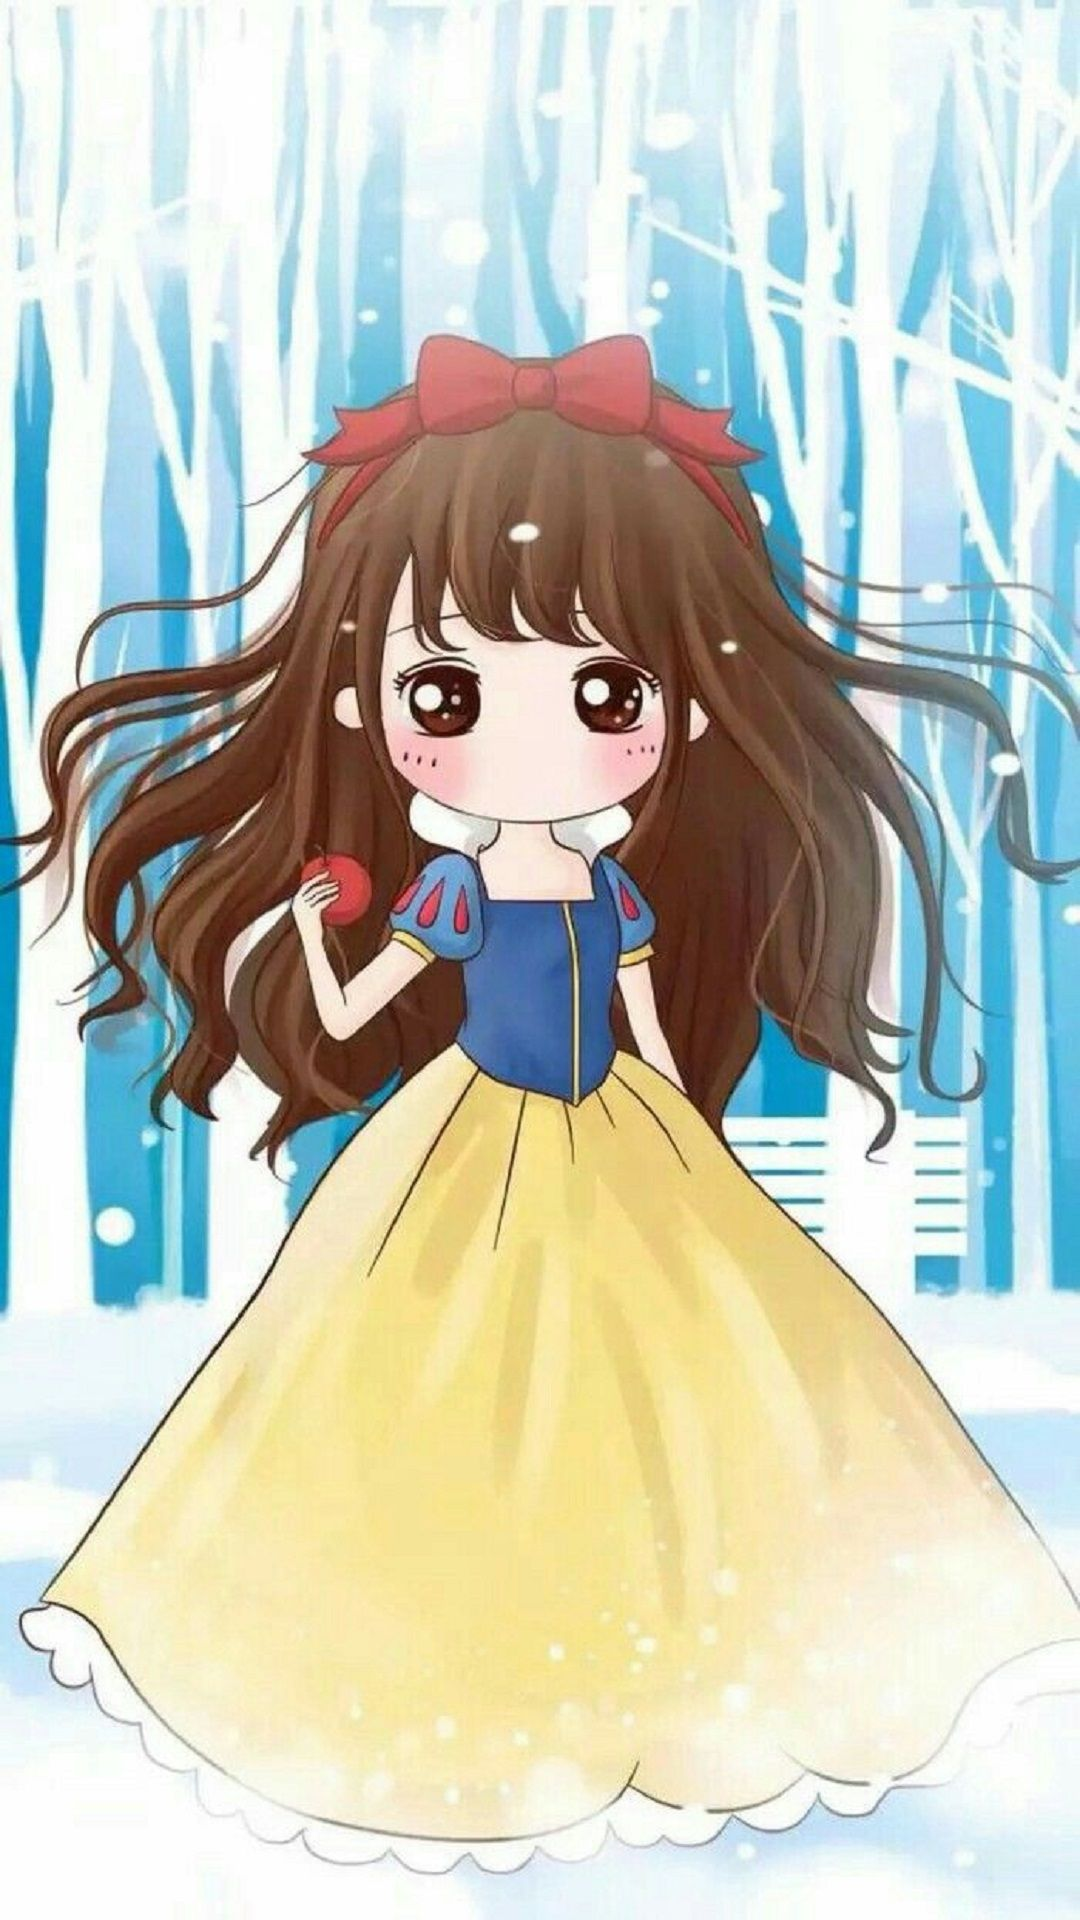 Snow White Tap to see more cute chibi kawaii girl